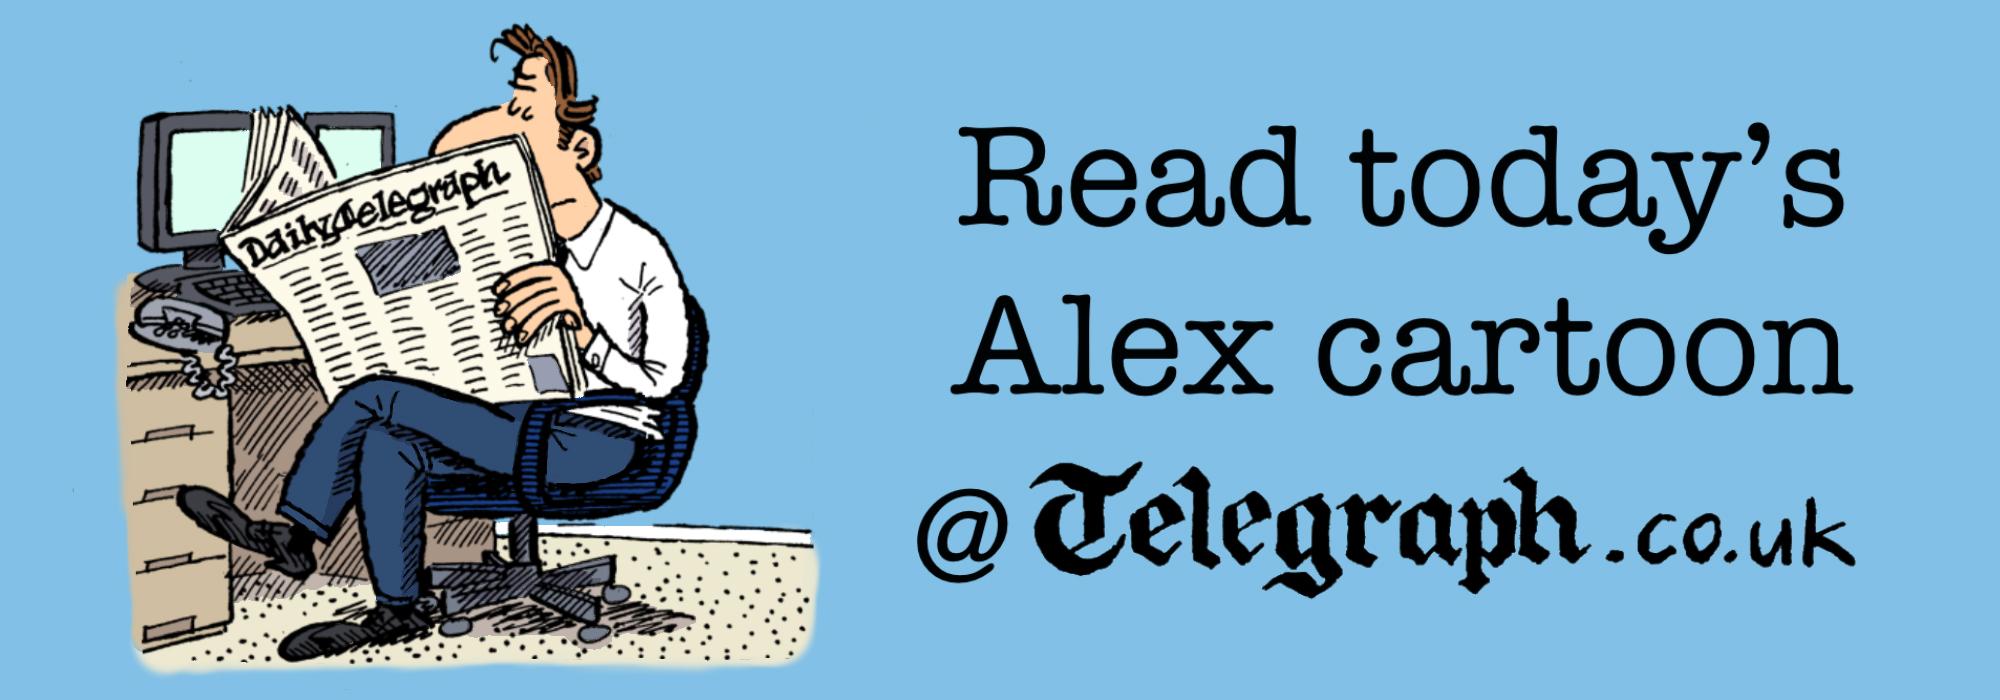 Telegraph link